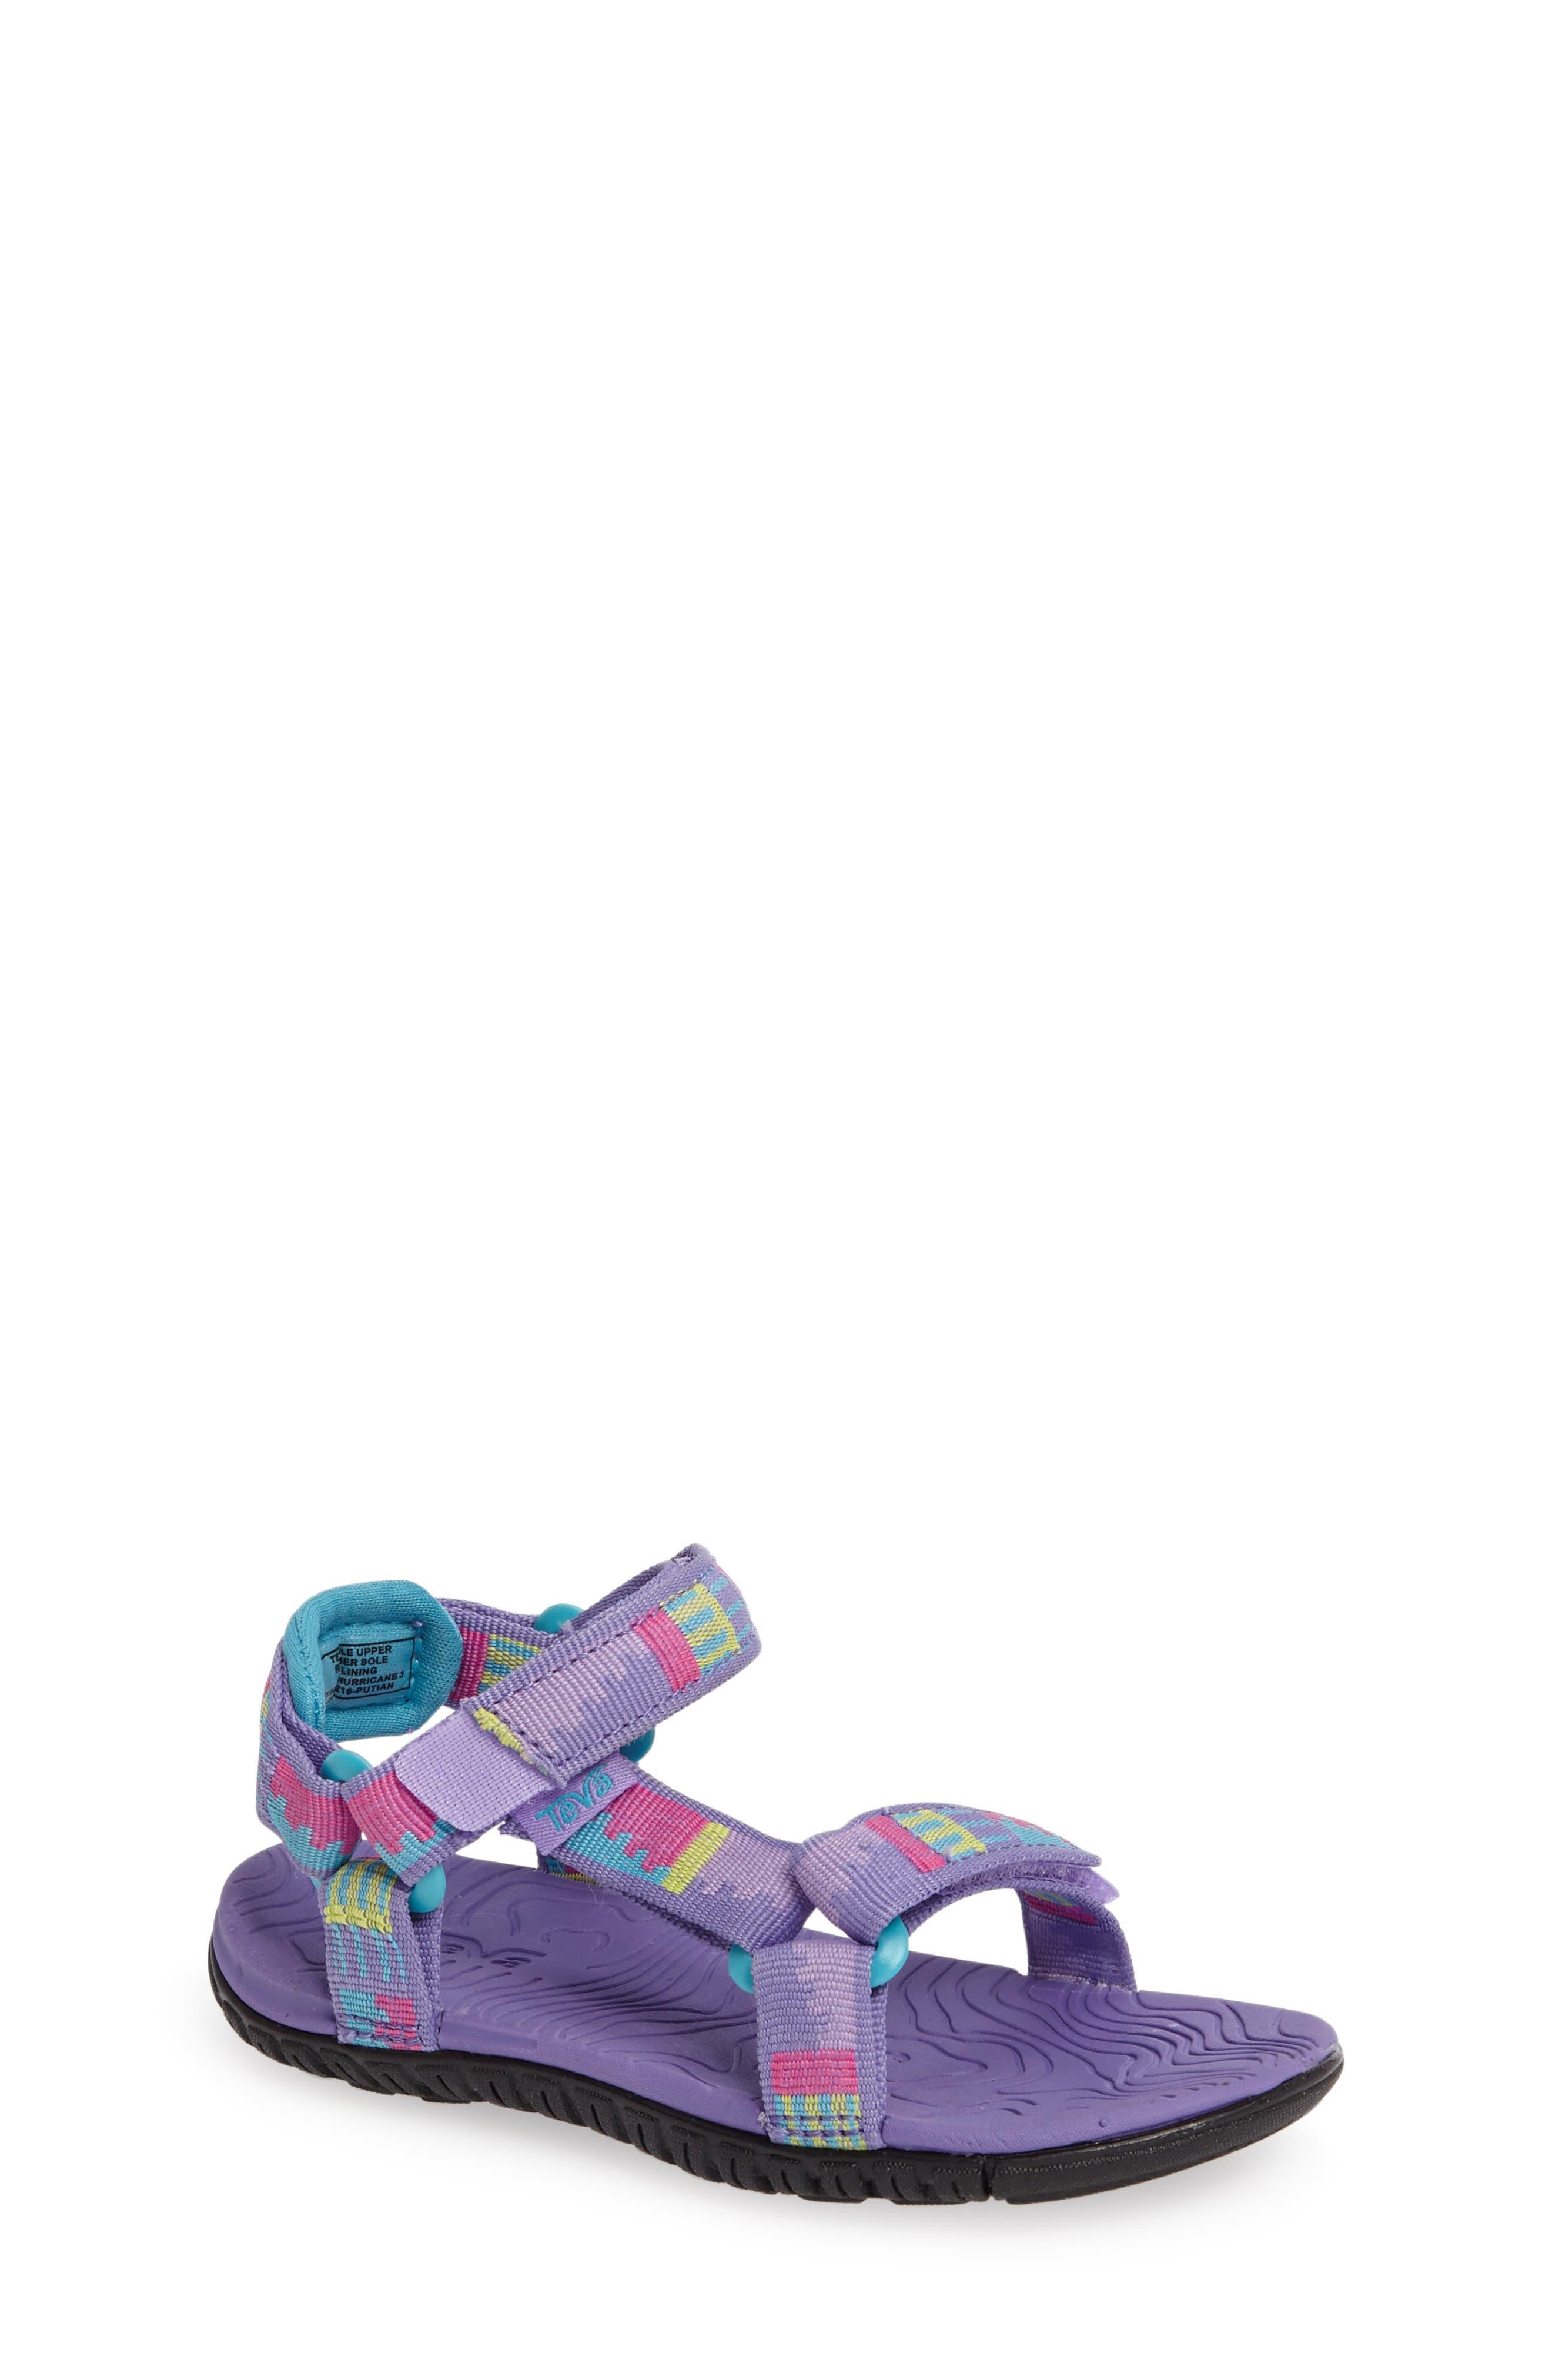 'Hurricane 3' Sport Sandal,                         Main,                         color, Purple